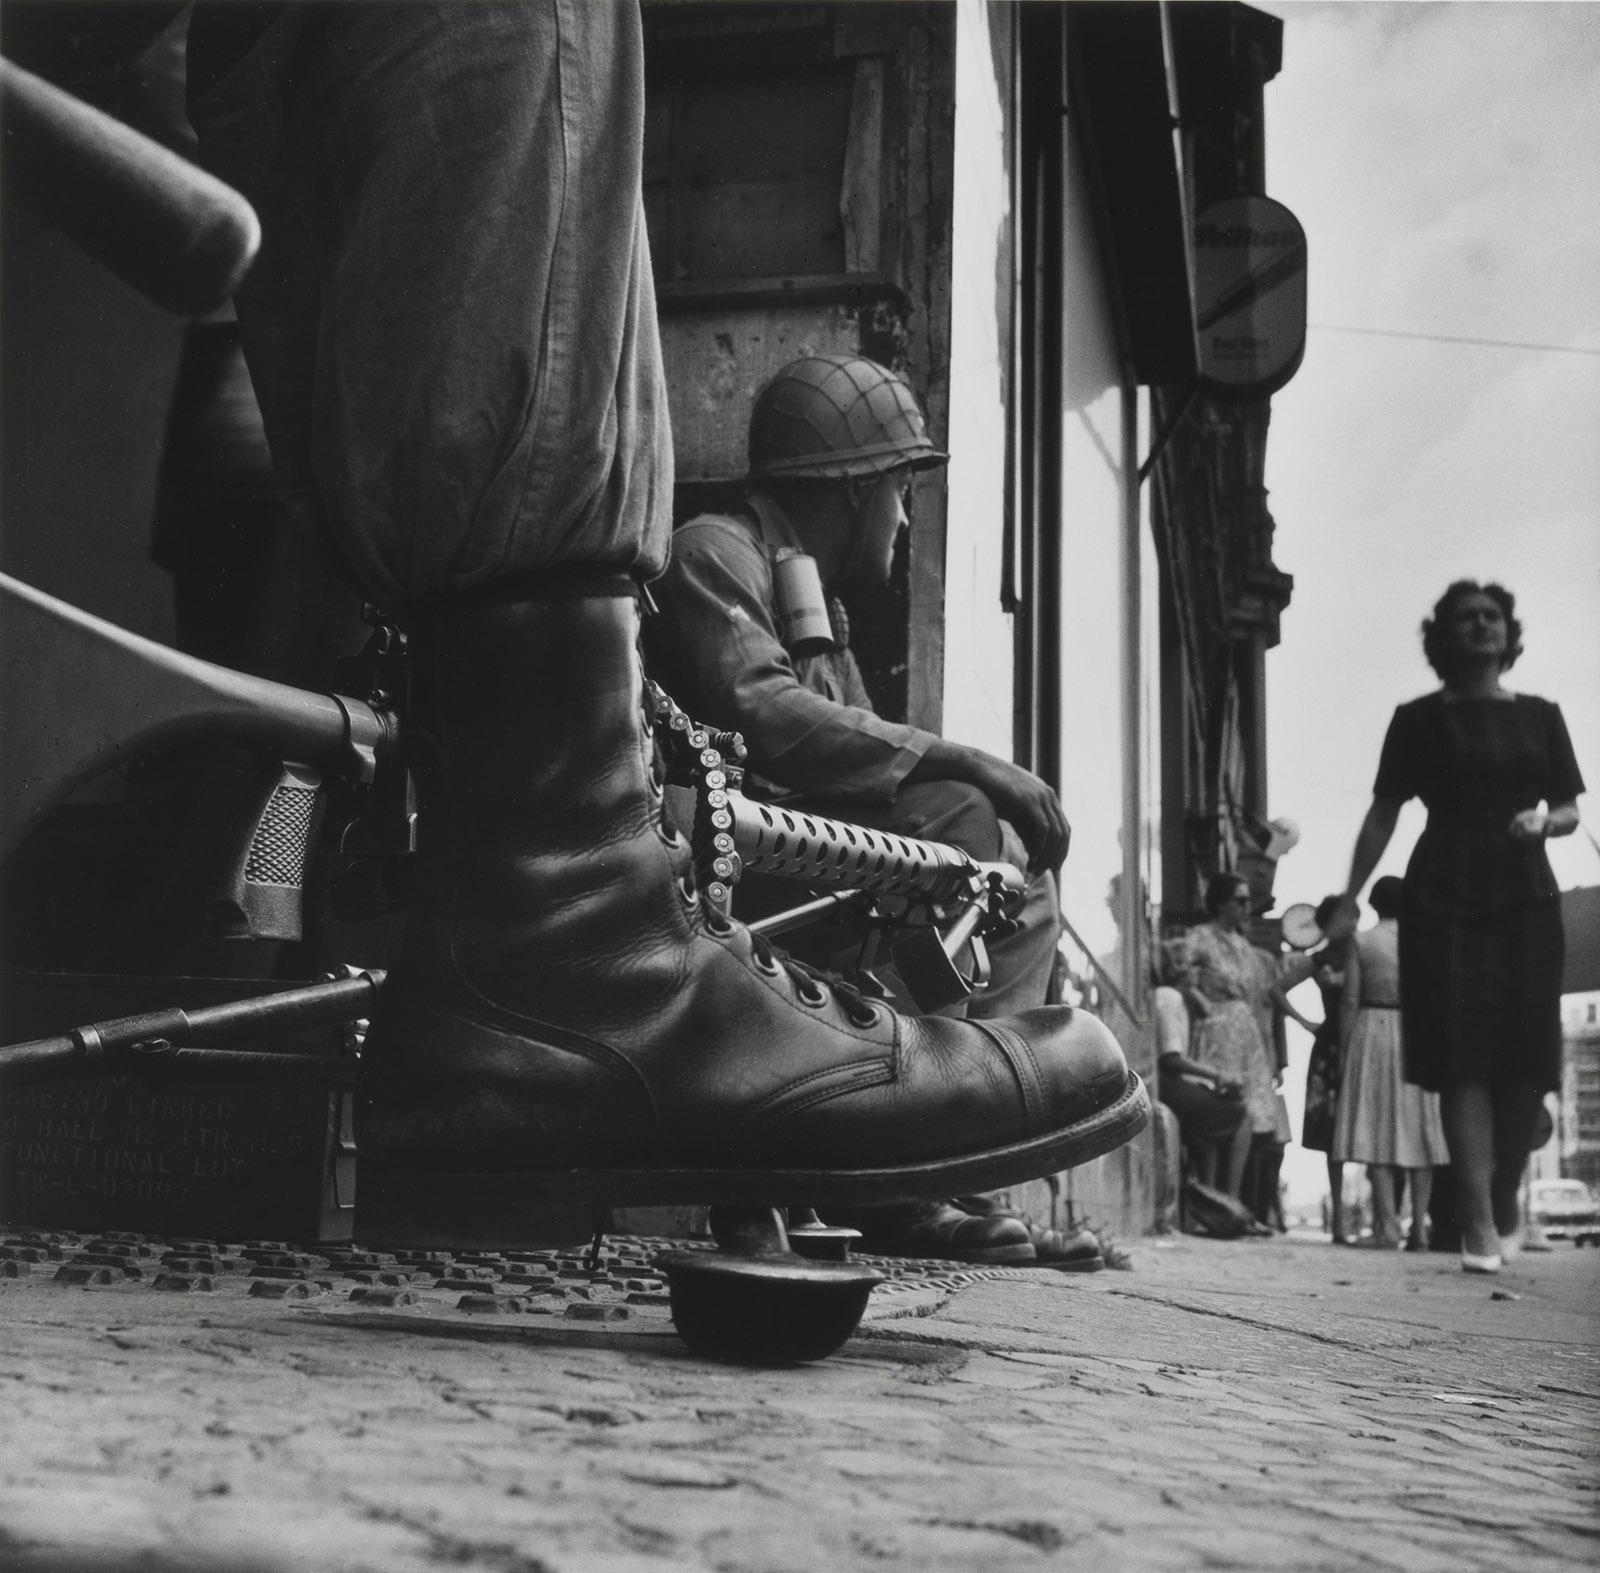 Near Checkpoint Charlie, Berlin, West Germany, 1961